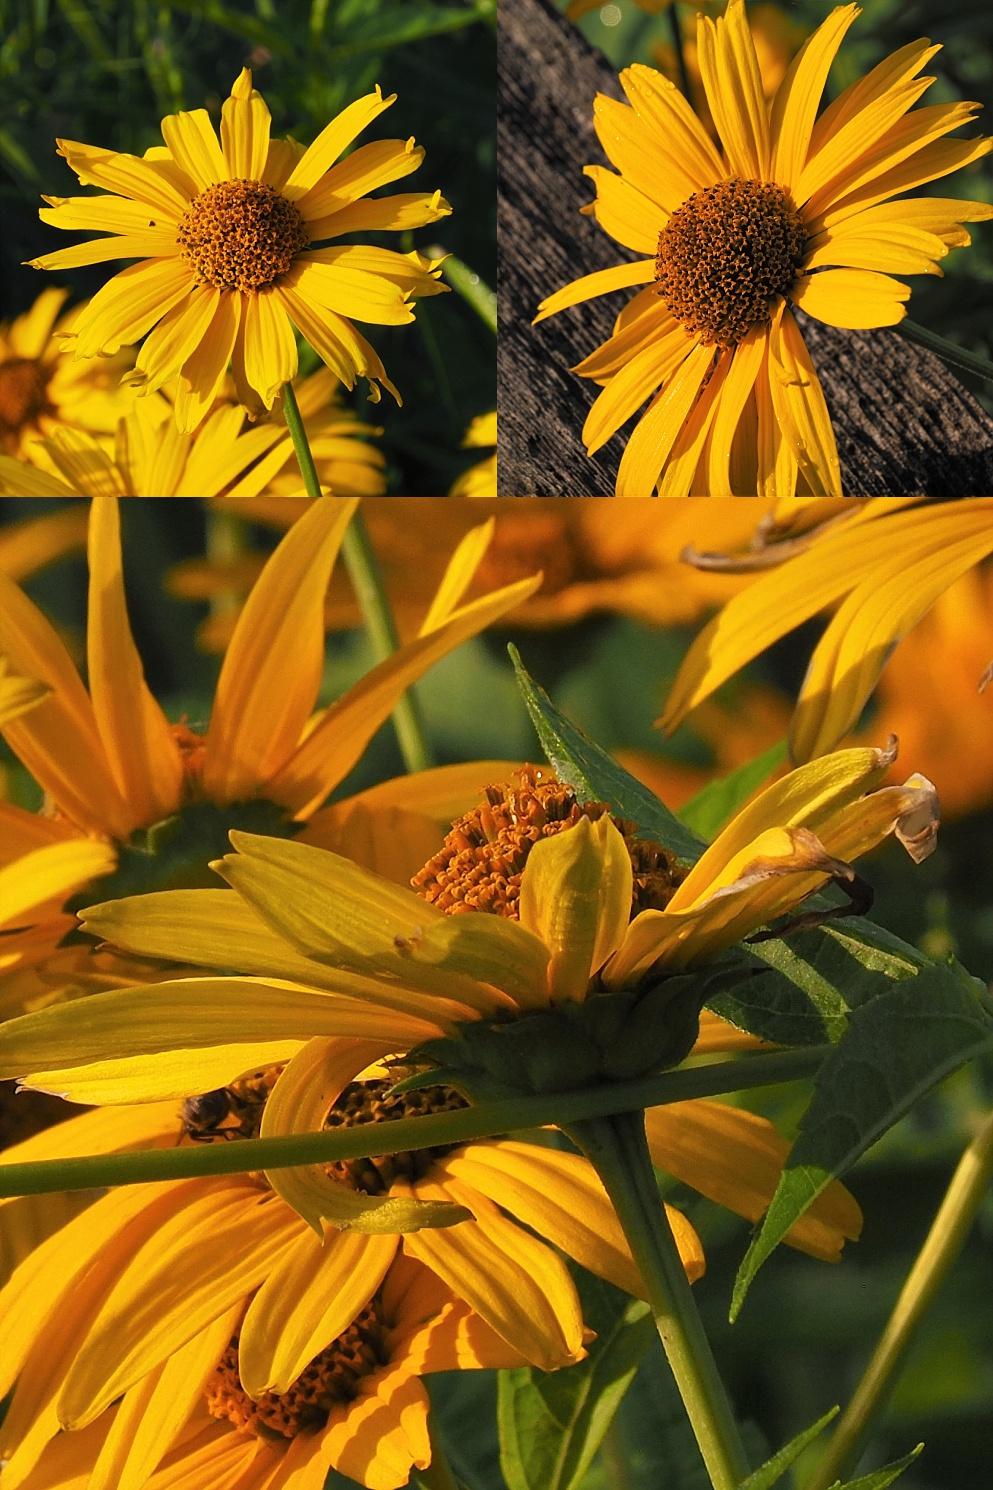 3-photo collage of black-eyed susans